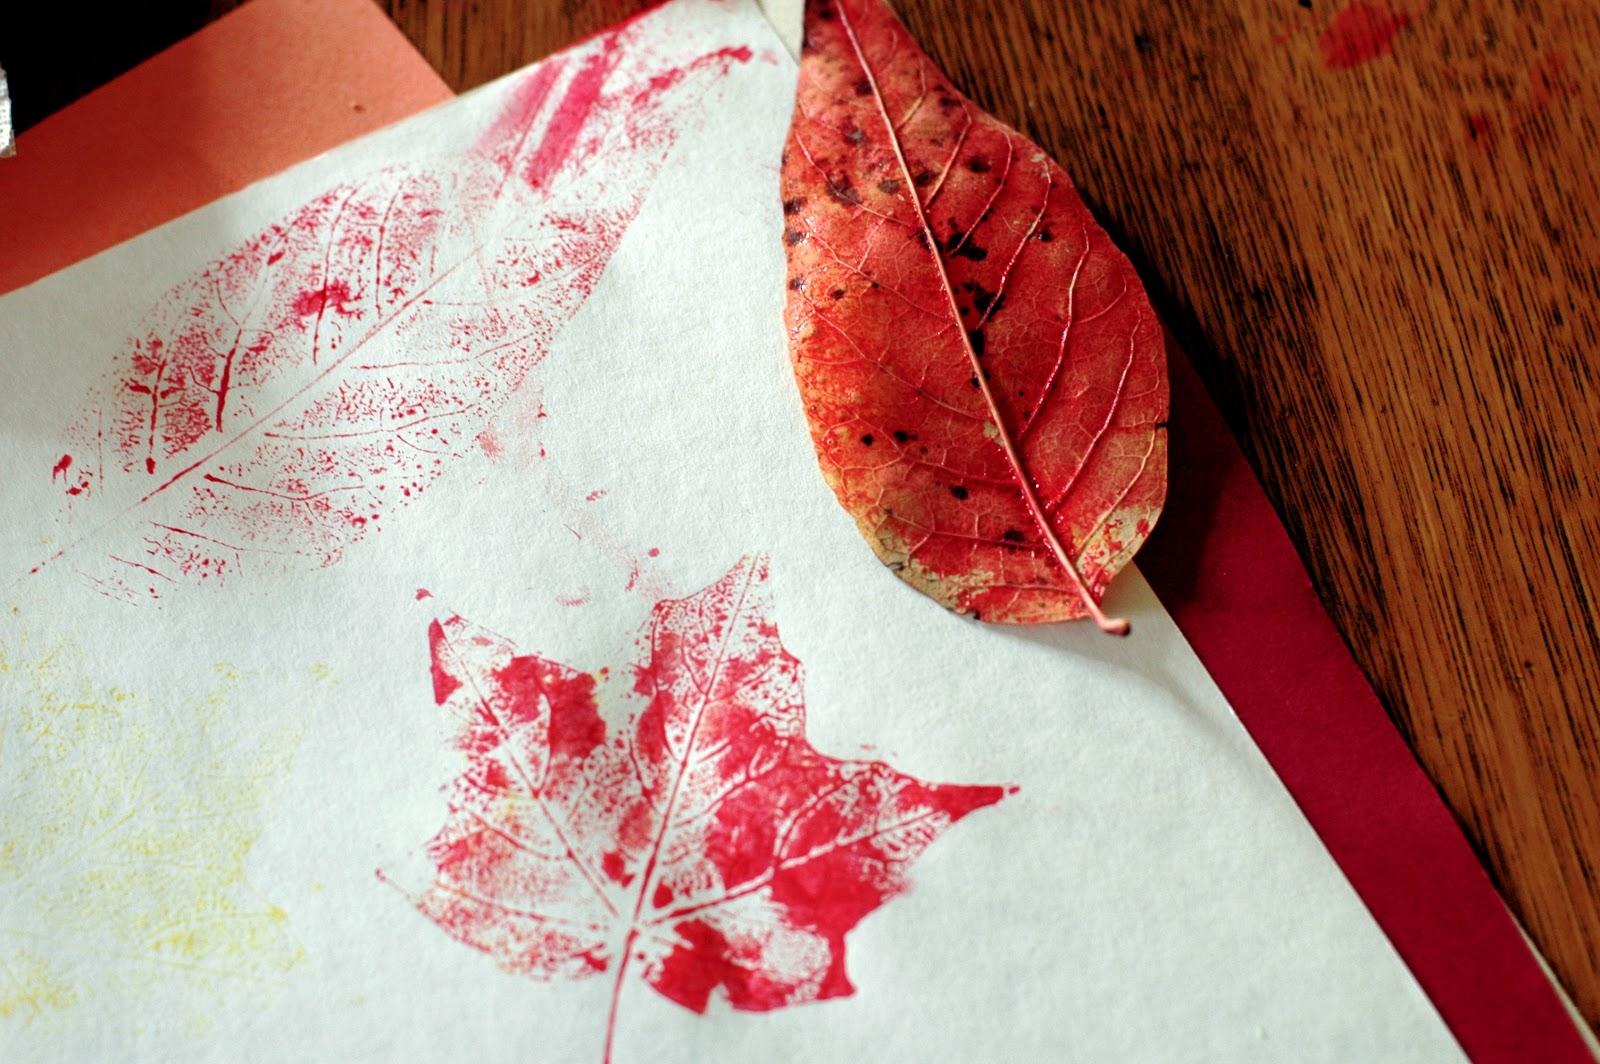 FreshlyPlanted: create (with kids): leaf printing